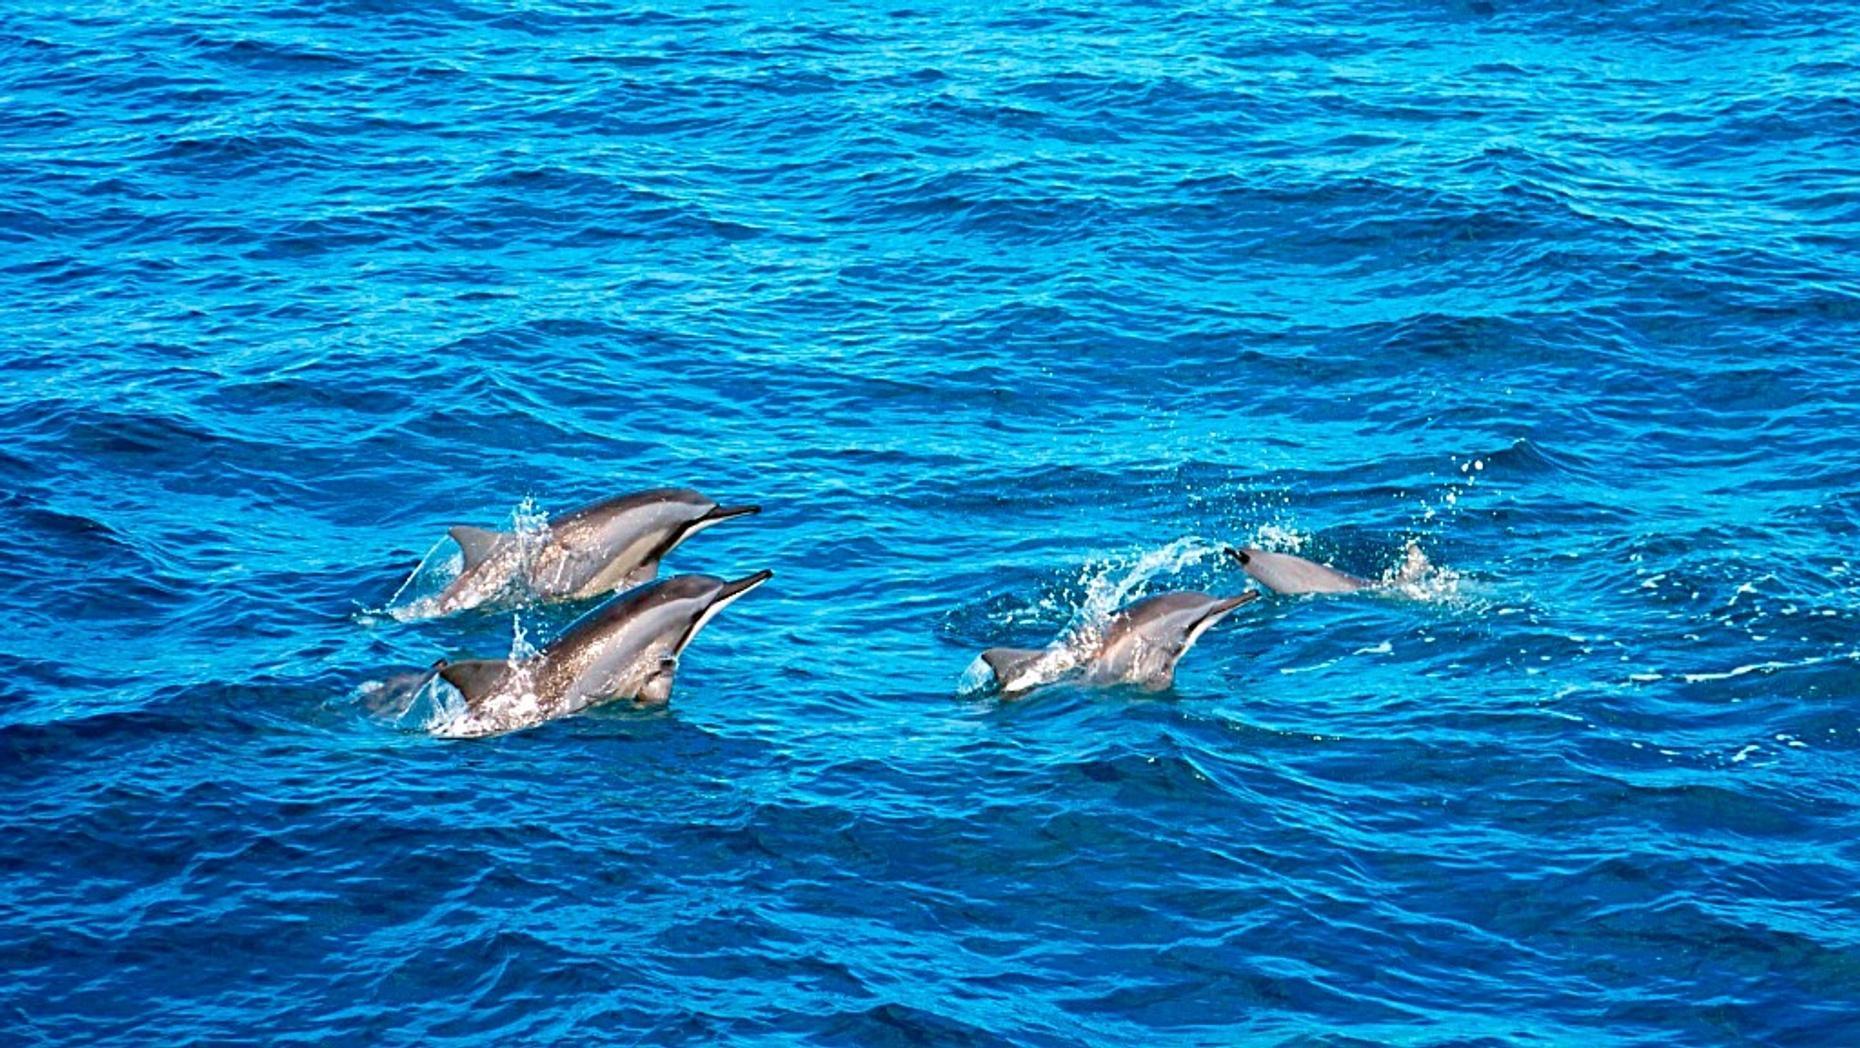 Two-Hour Dolphin Boat Tour around Hilton Head